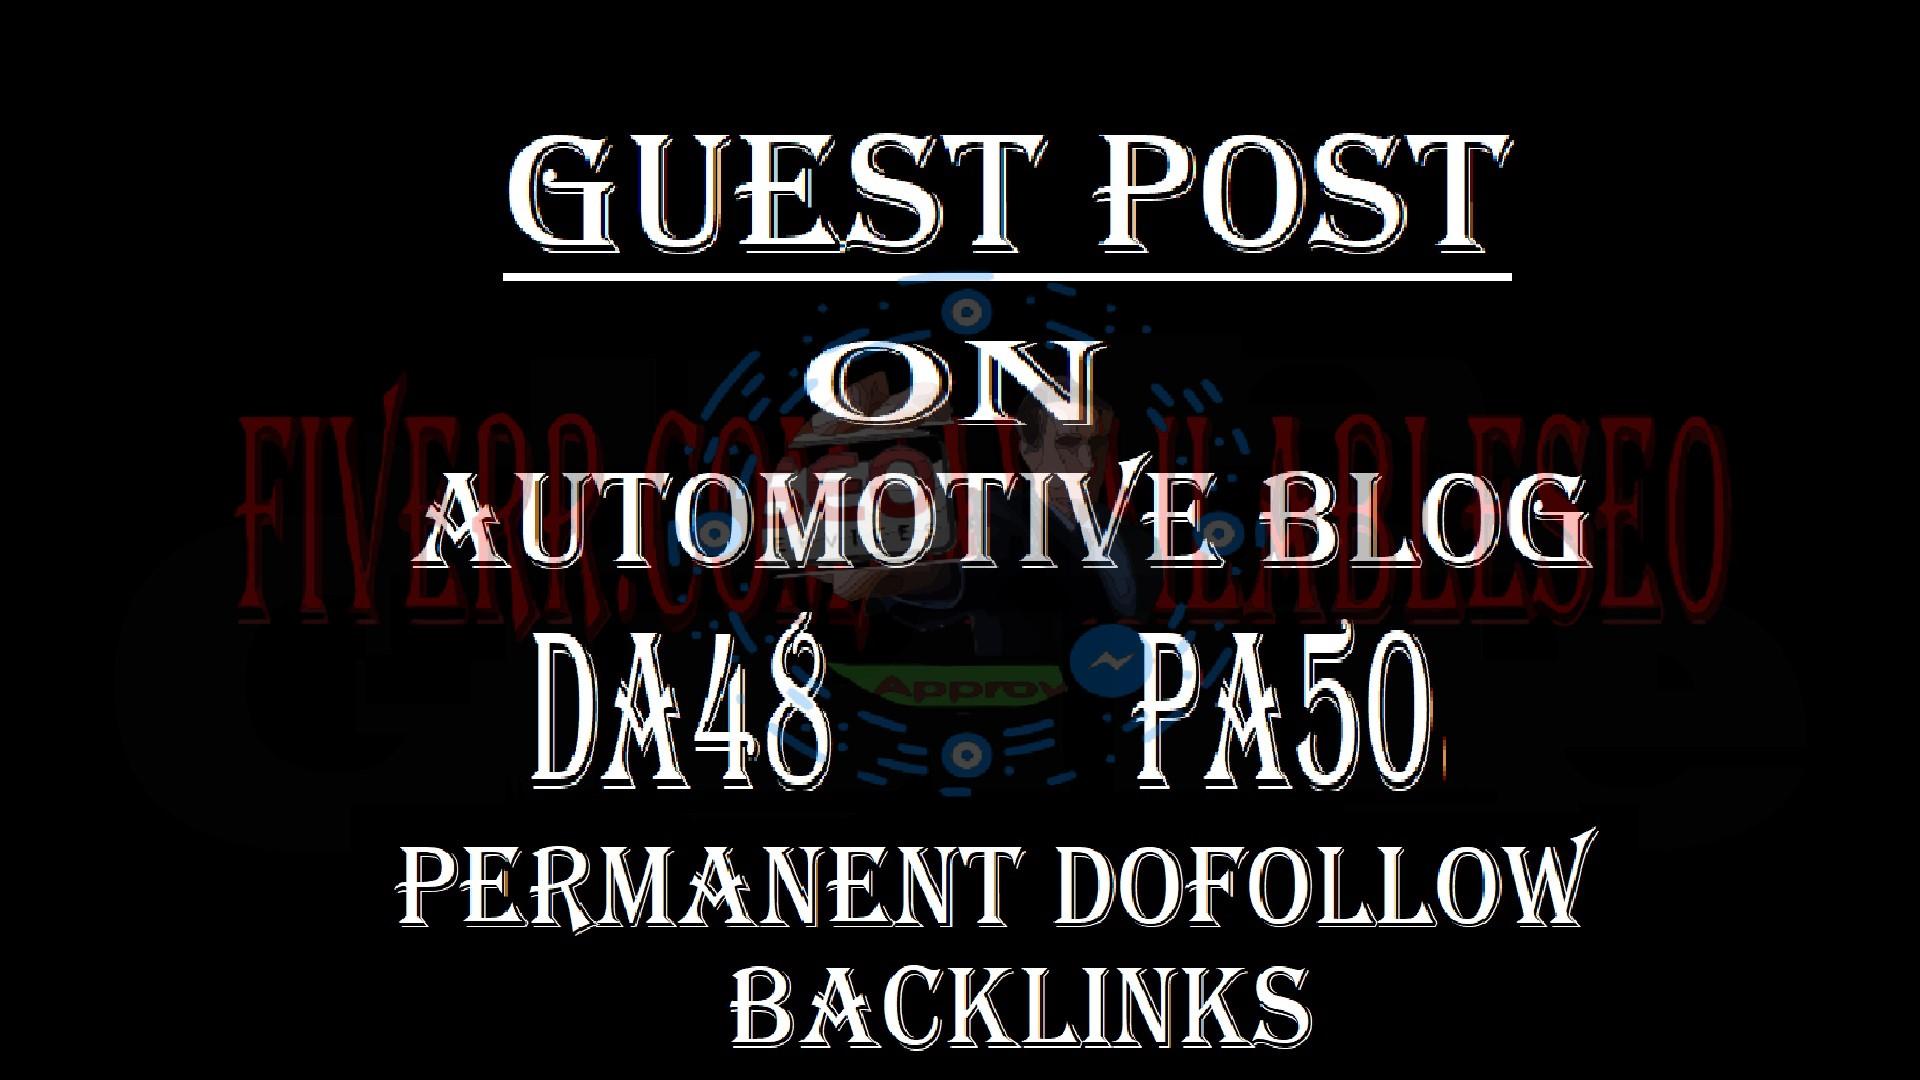 Do Publish Guest Post On Auto Blogging Site cardomain. com Da77